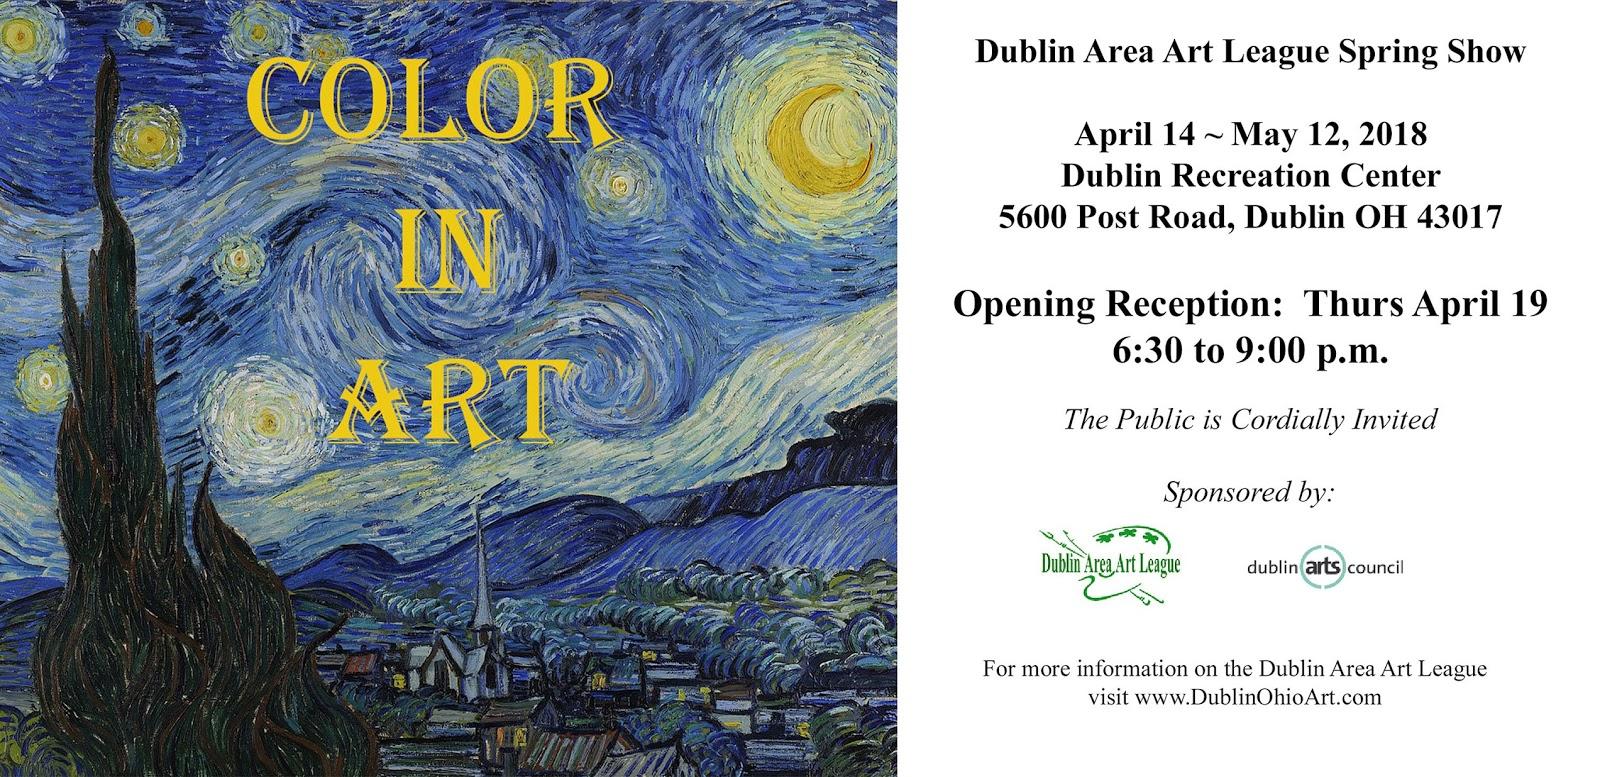 Color in Art - Spring 2018 DAAL Member Show | Dublin Area Art League